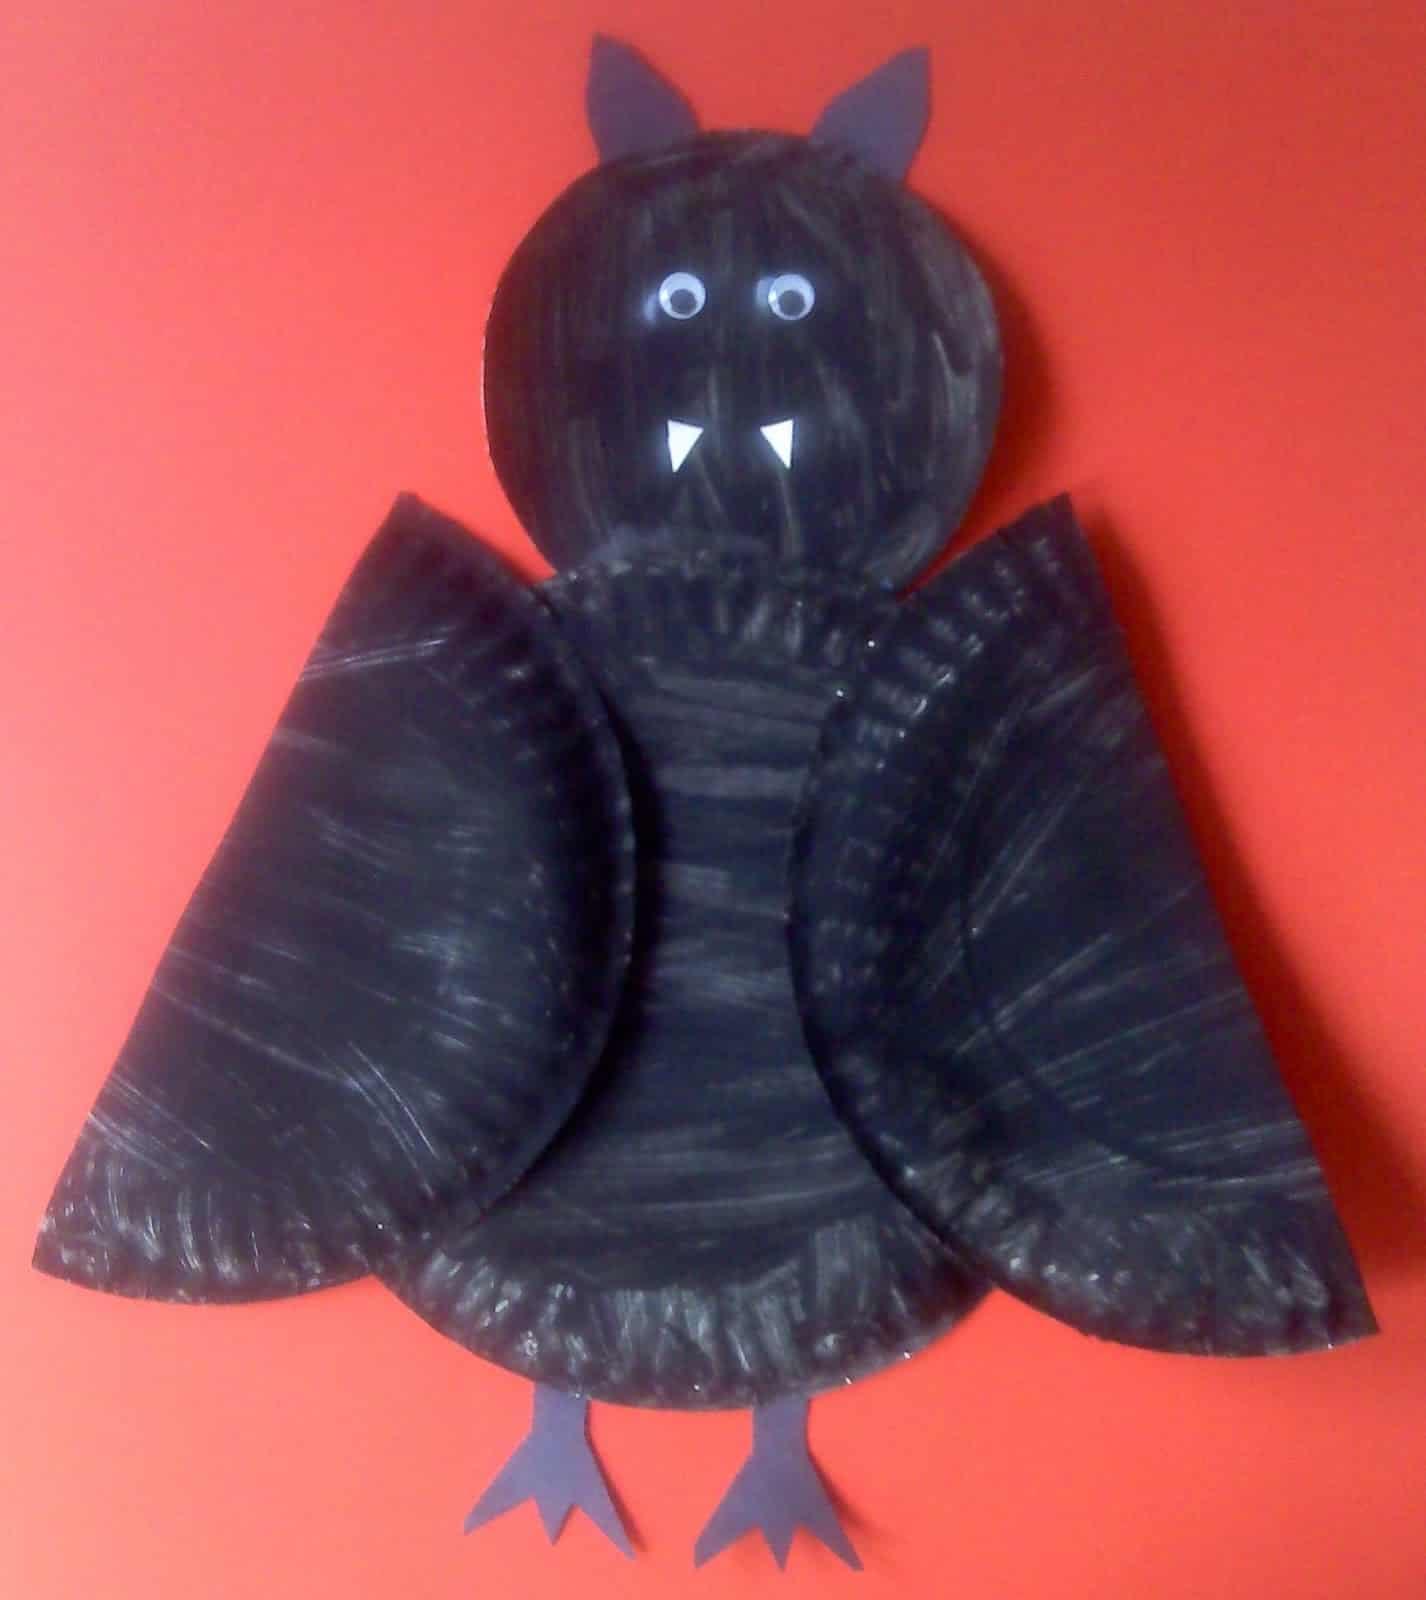 2. Paper plate bats & 15 Fun Bat Themed Crafts for Kids